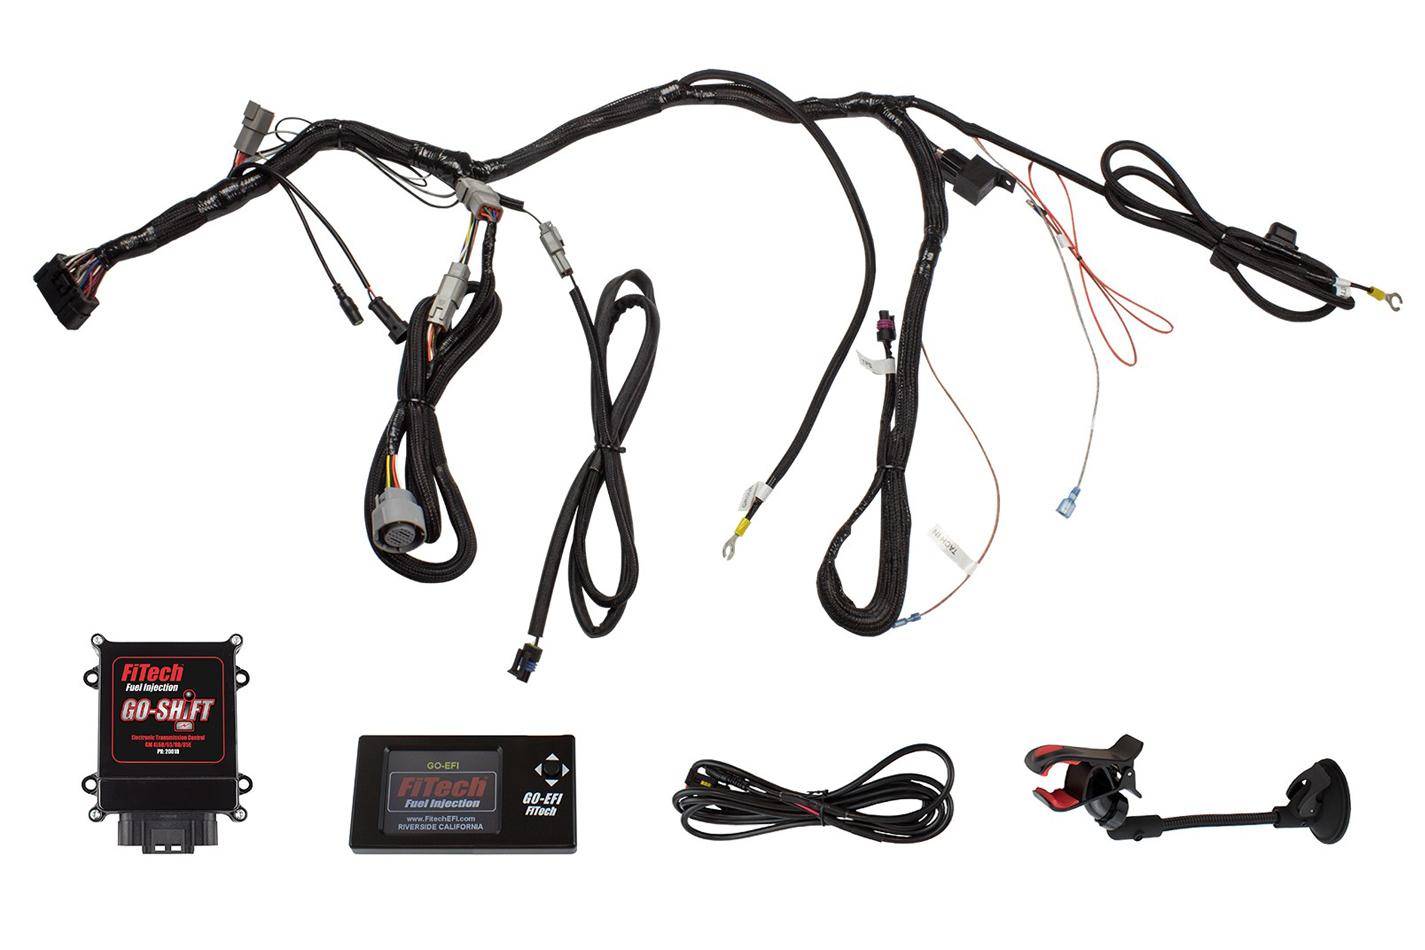 Fitech Fuel Injection 20010 Transmission Control Unit, 4L60 / 4L65 / 4L80 / 4L85E to FiTech Ultimate EFI, Kit